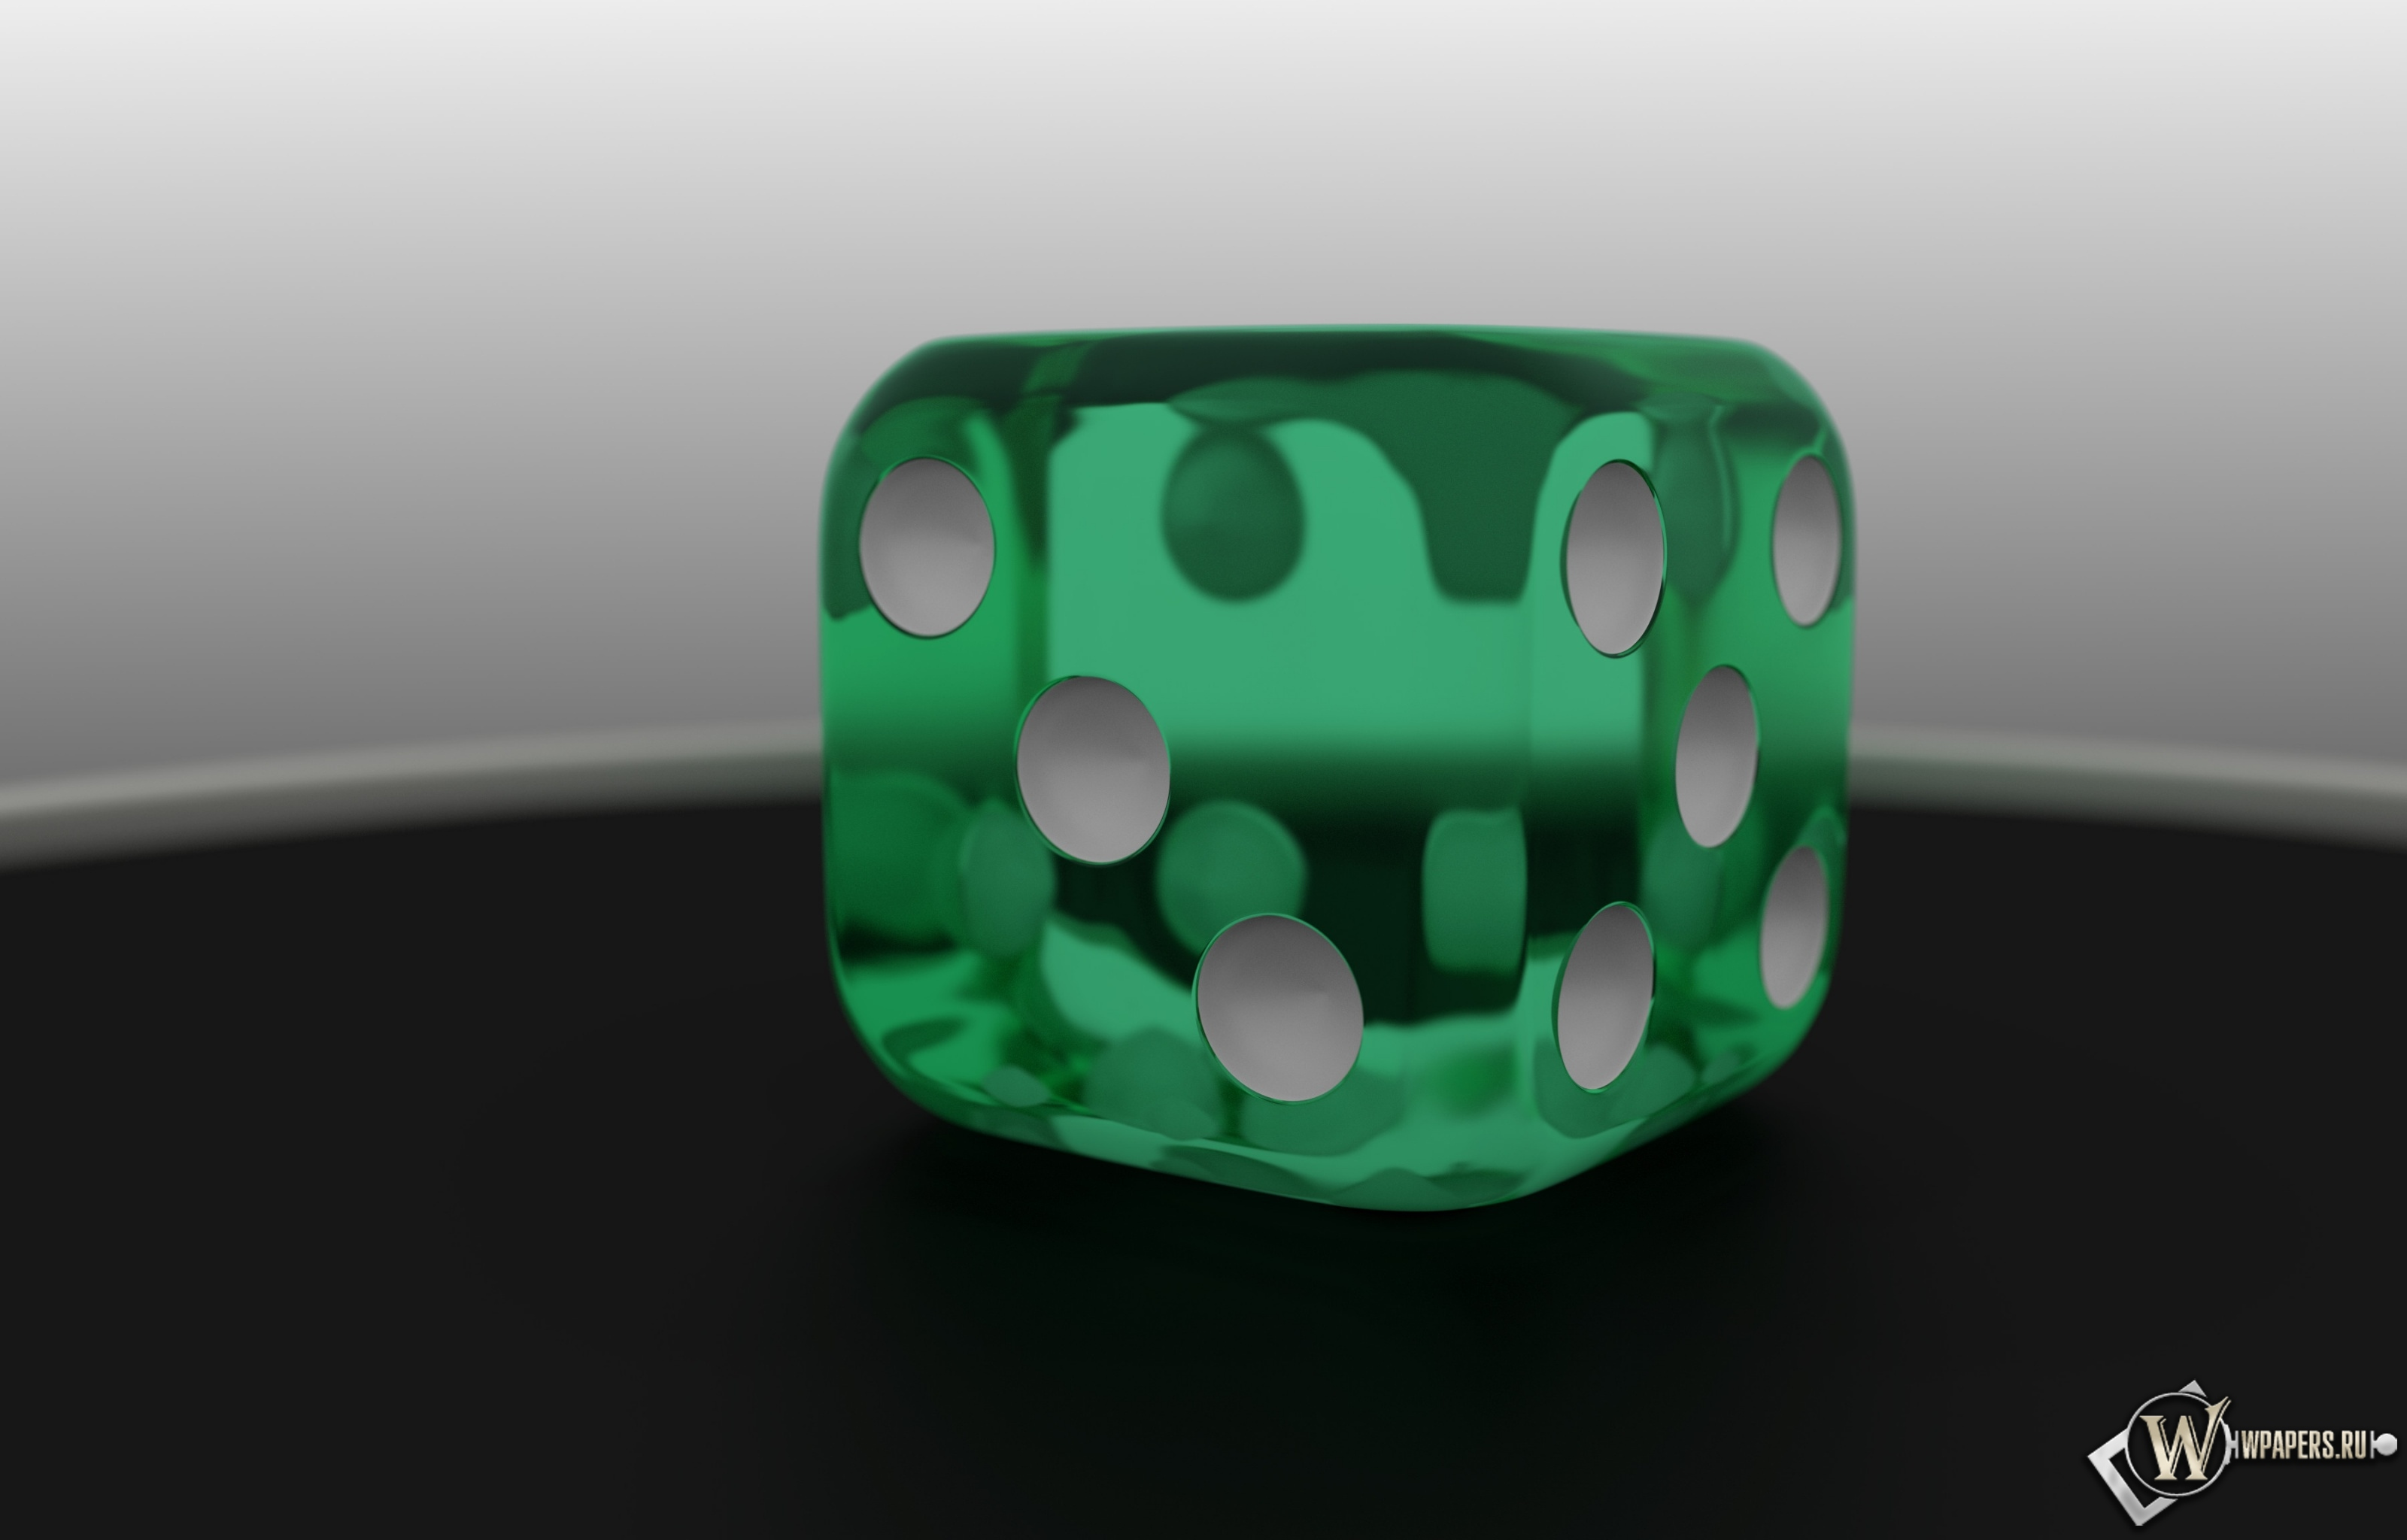 The Cube Original Headwitcher CG 3200x2048